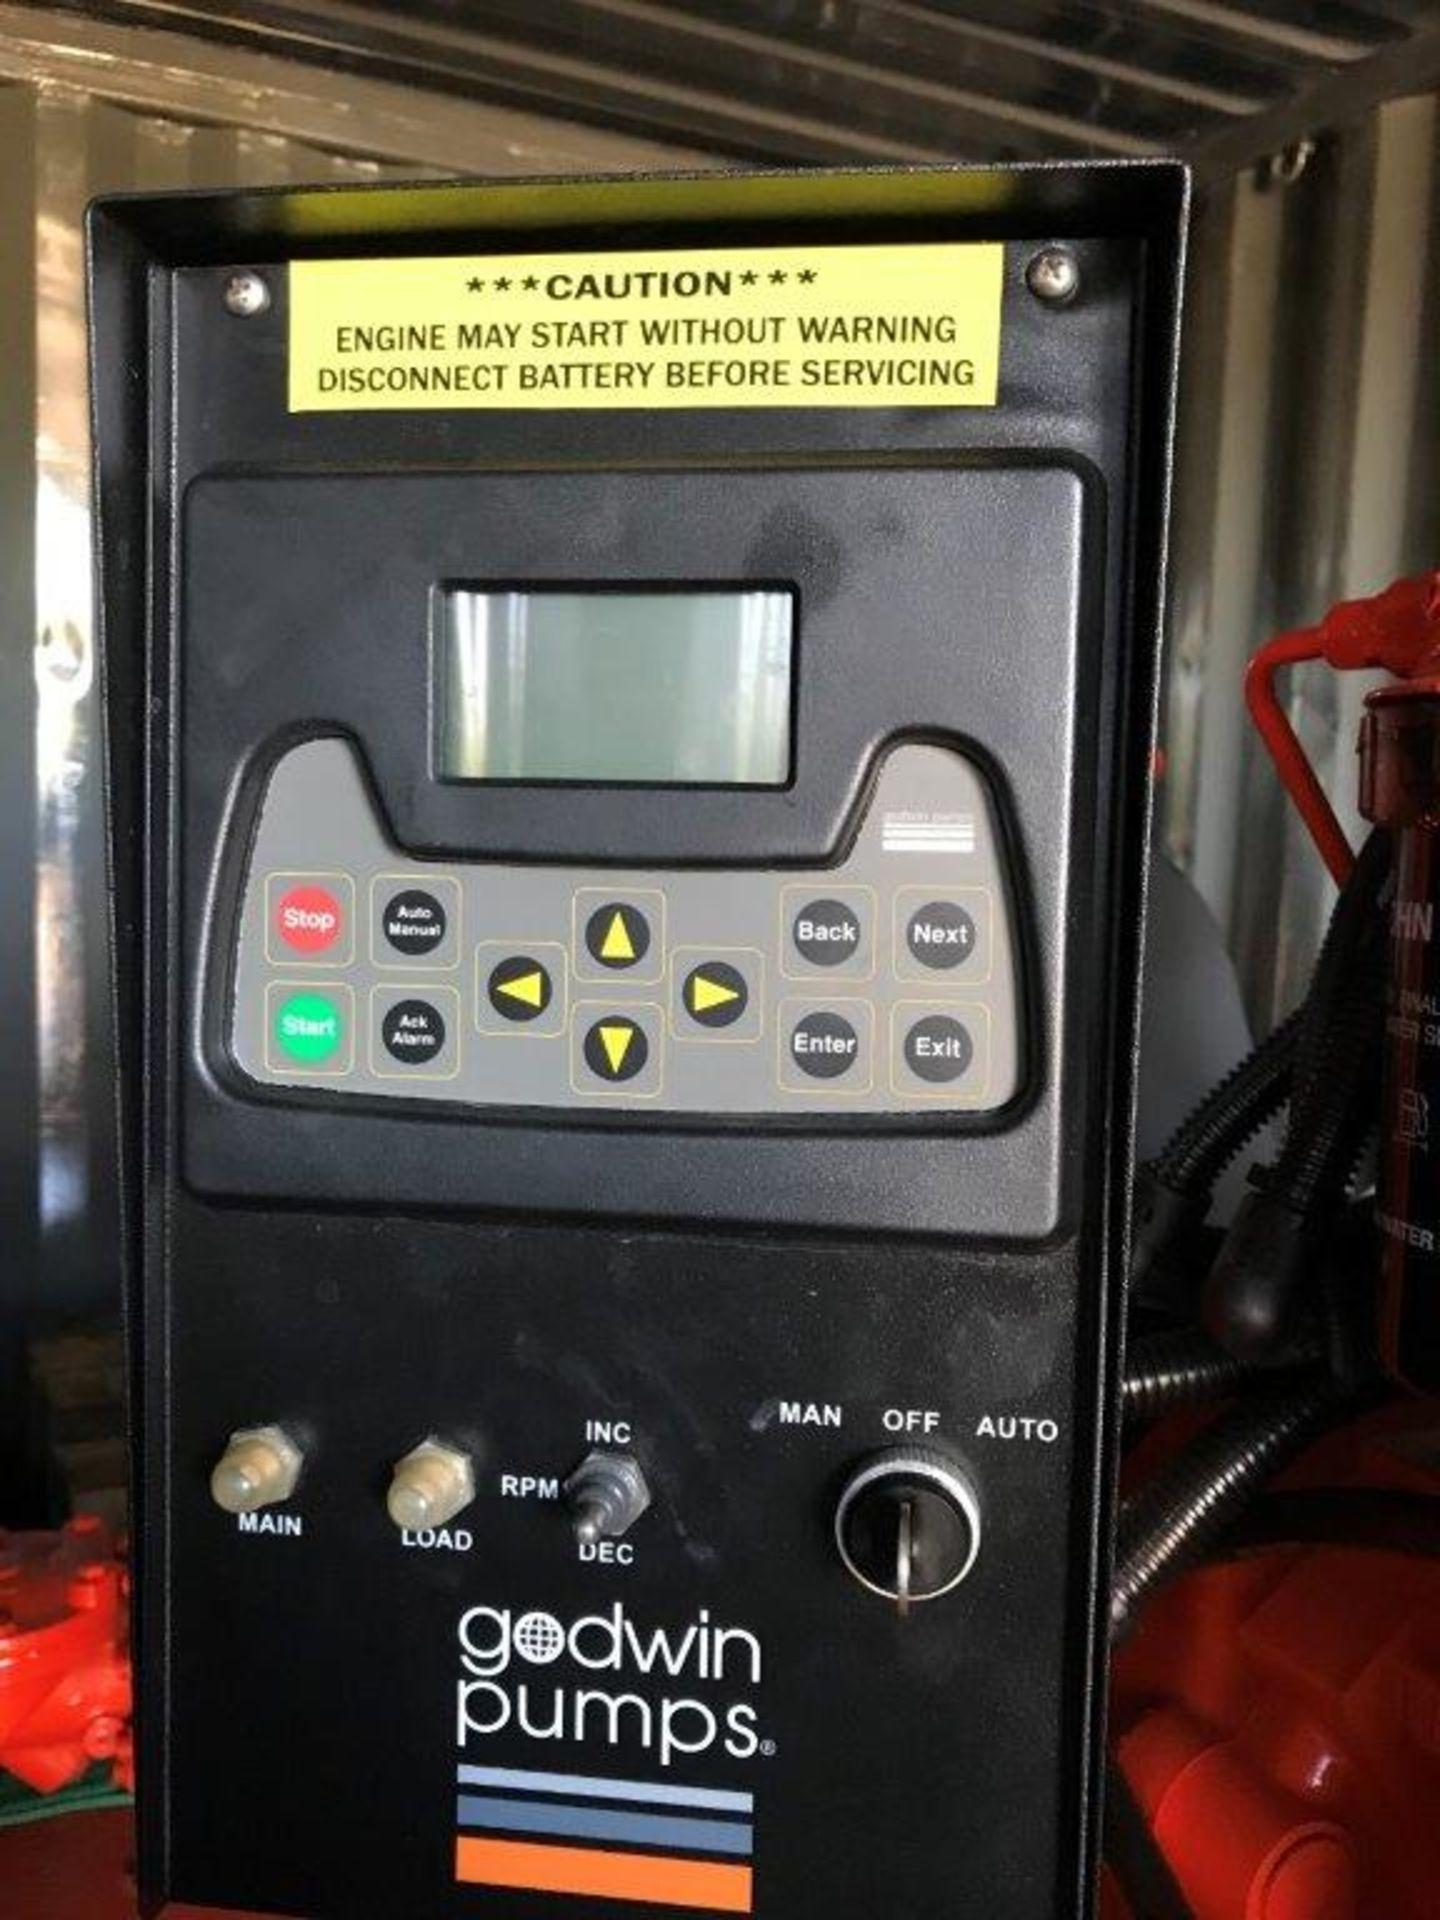 GODWIN DRI-PRIME INJECTION PUMP, MODEL HL110M, W/ JOHN DEERE 6.8 L DIESEL ENGINE, 156 HP, MODEL - Image 3 of 6